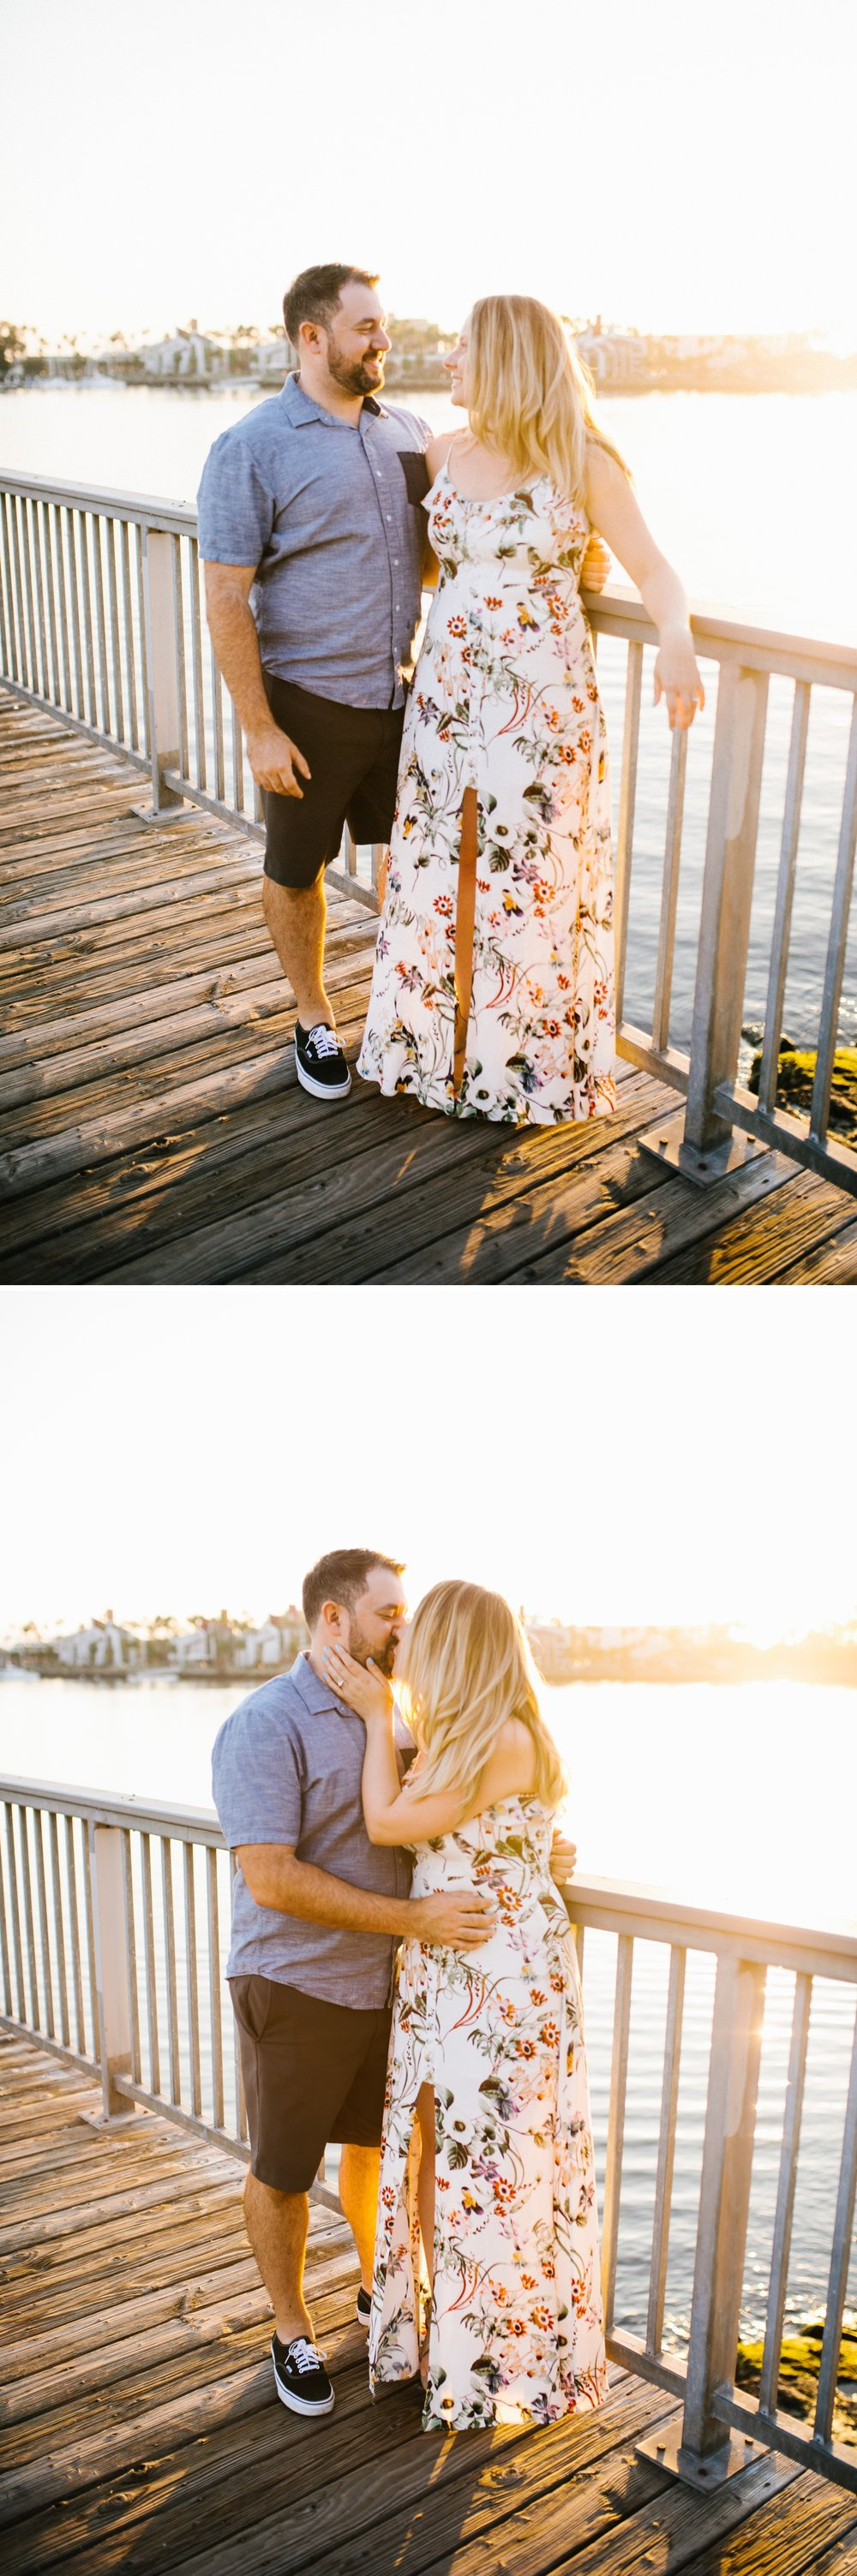 Long Beach Engagement_0006.jpg